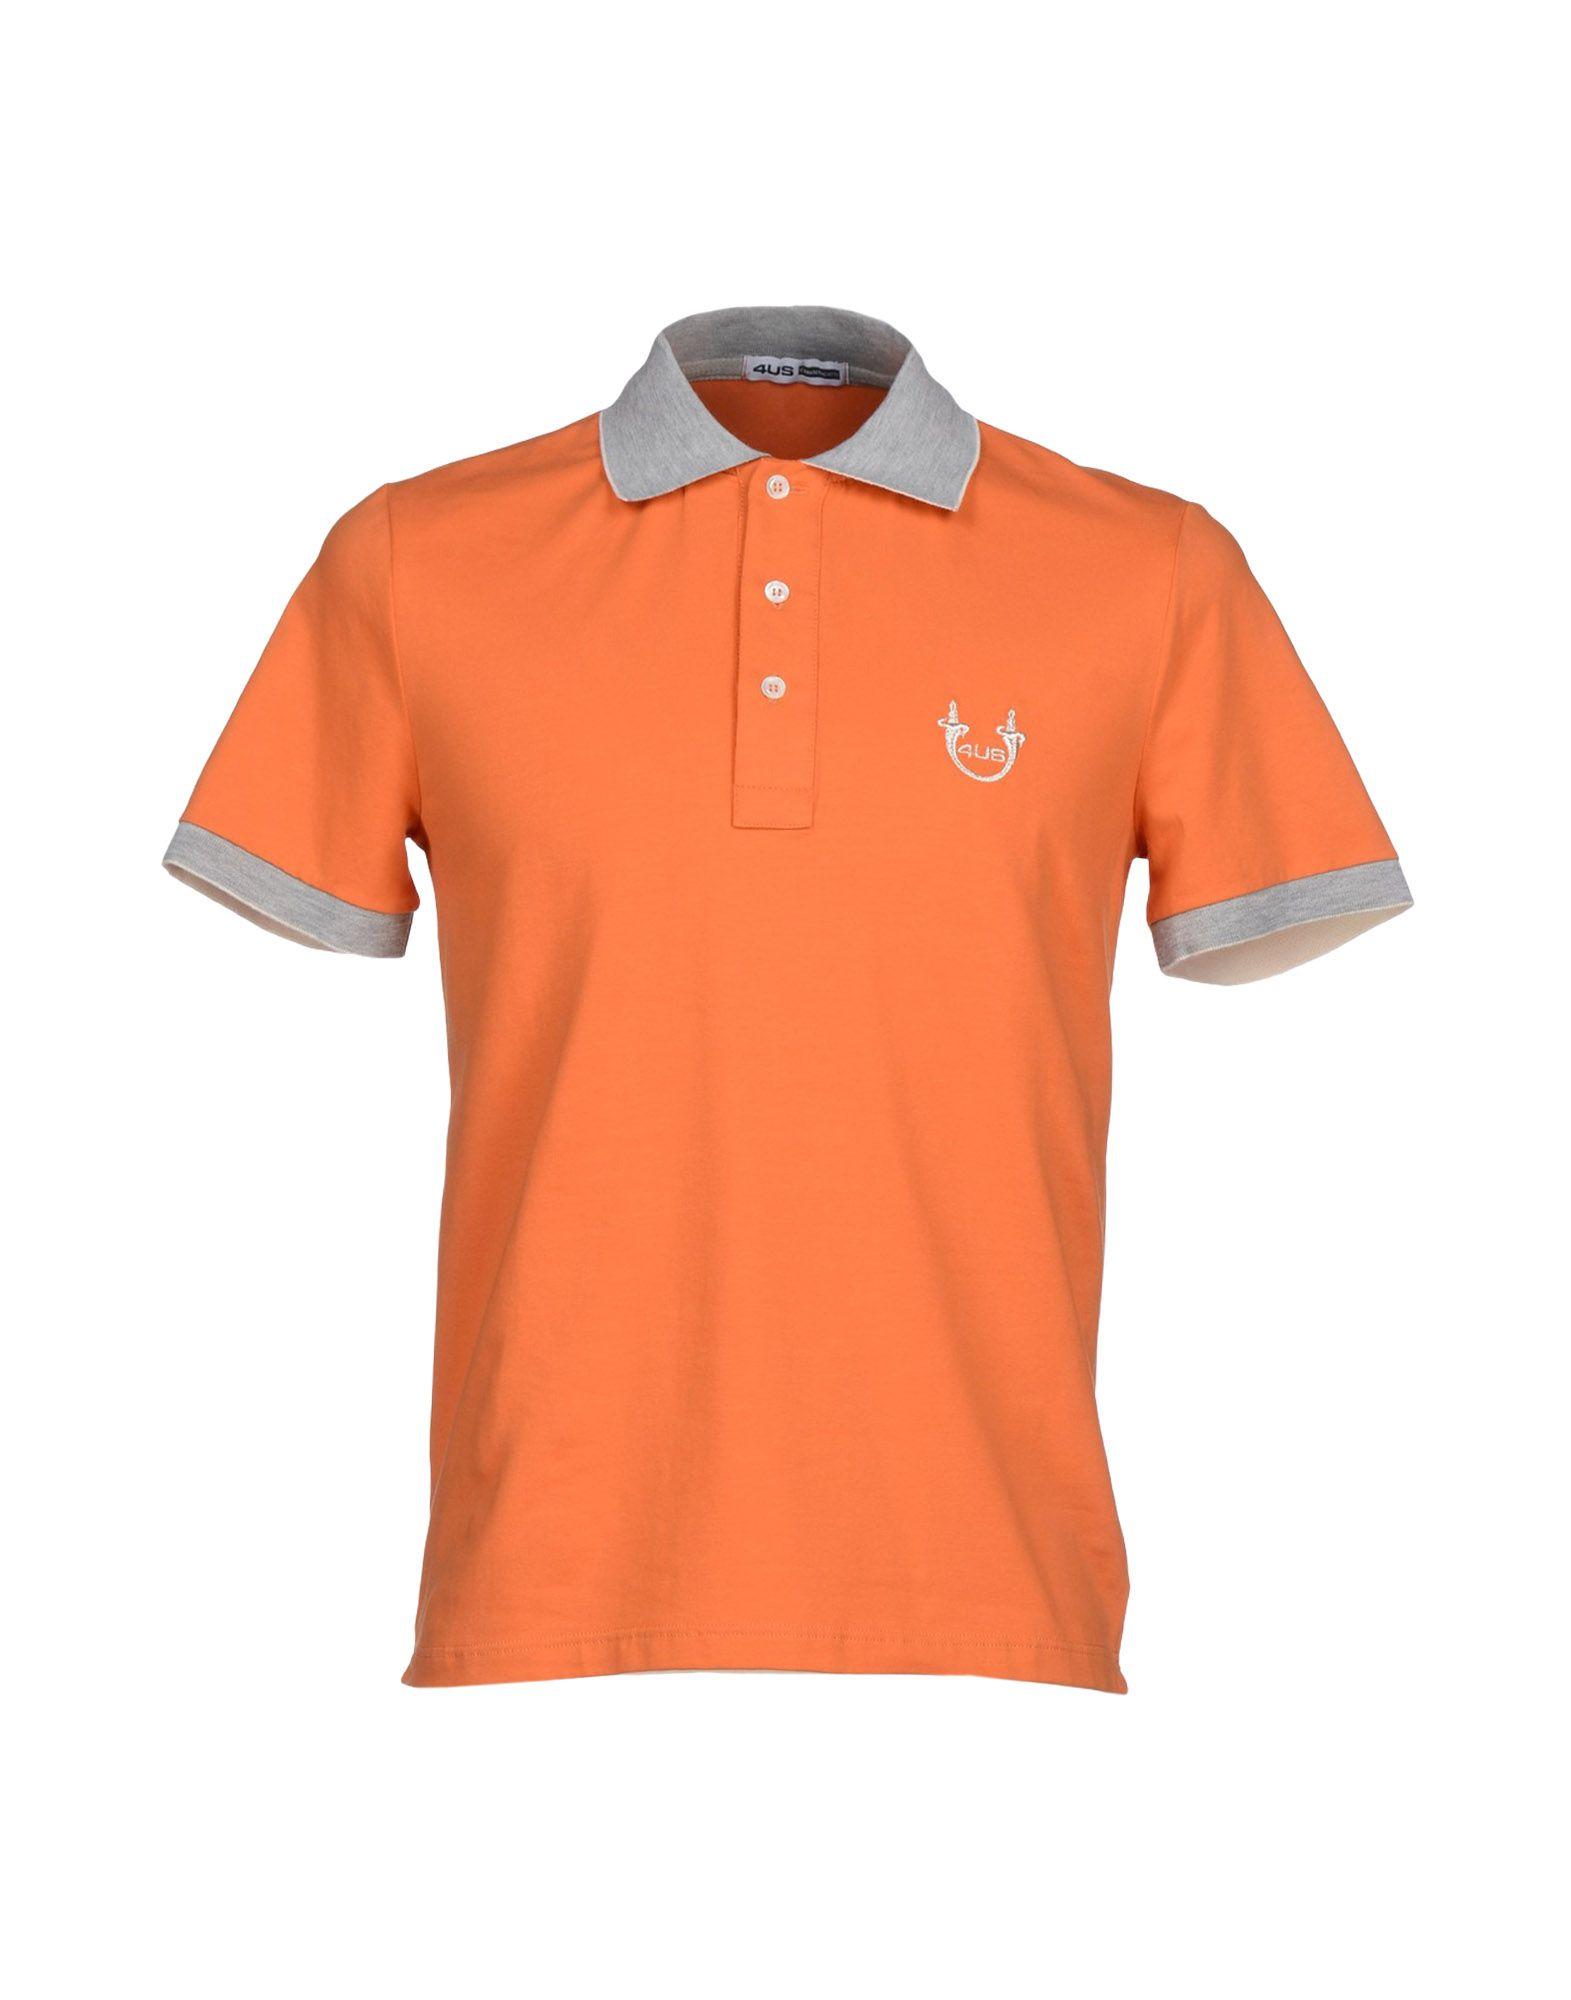 Cesare paciotti polo shirt in orange for men lyst for Orange polo shirt mens